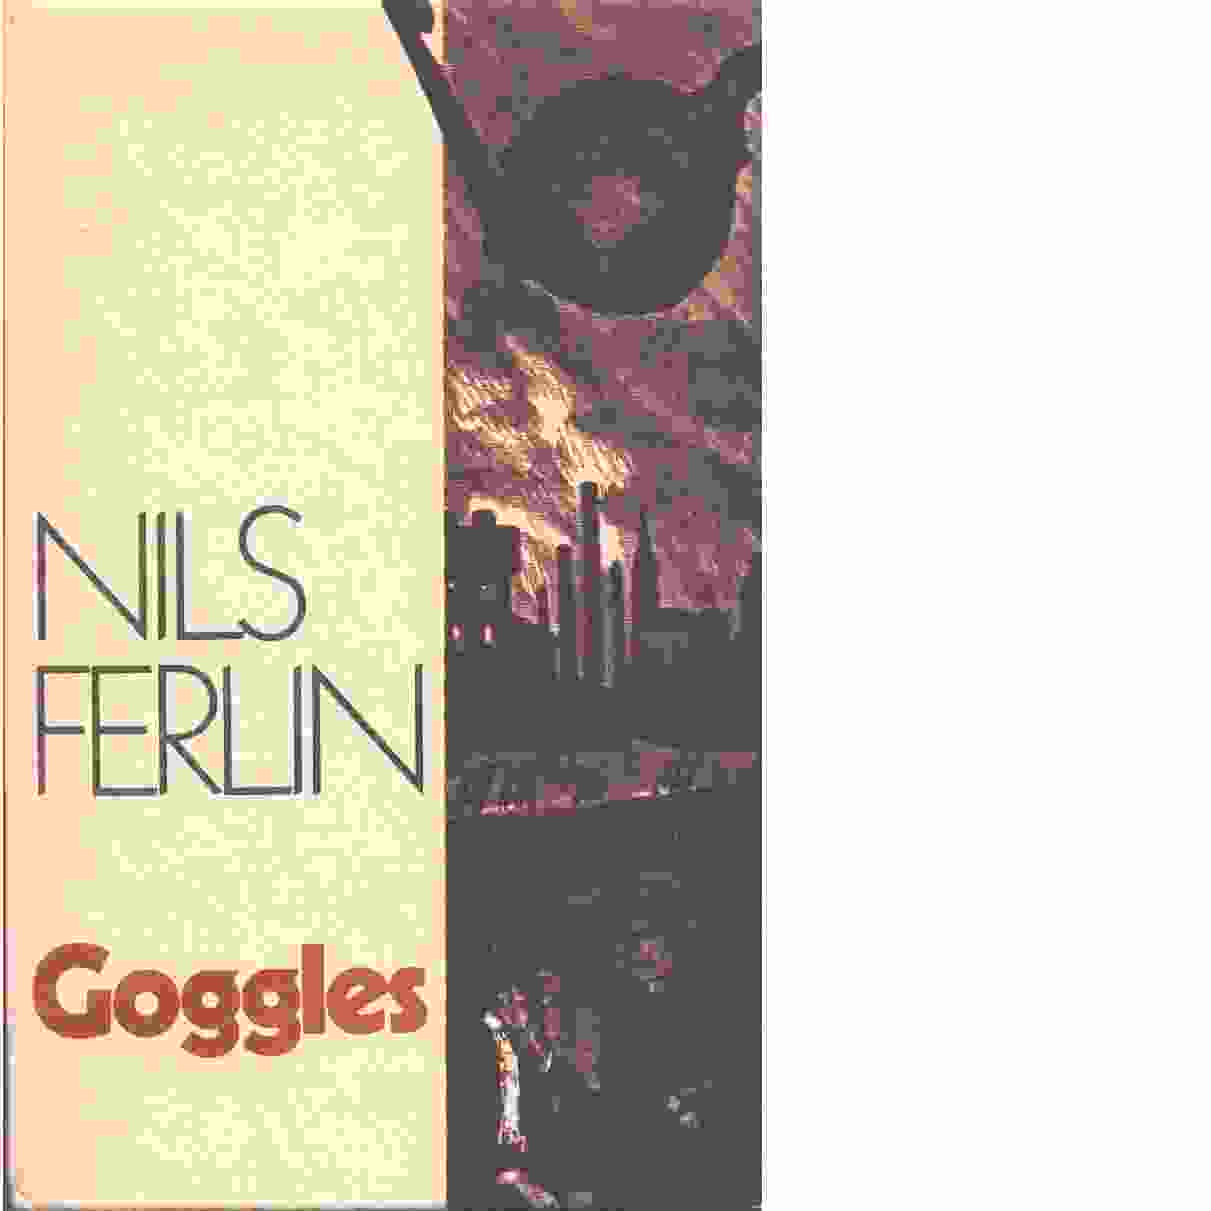 Goggles - Ferlin, Nils